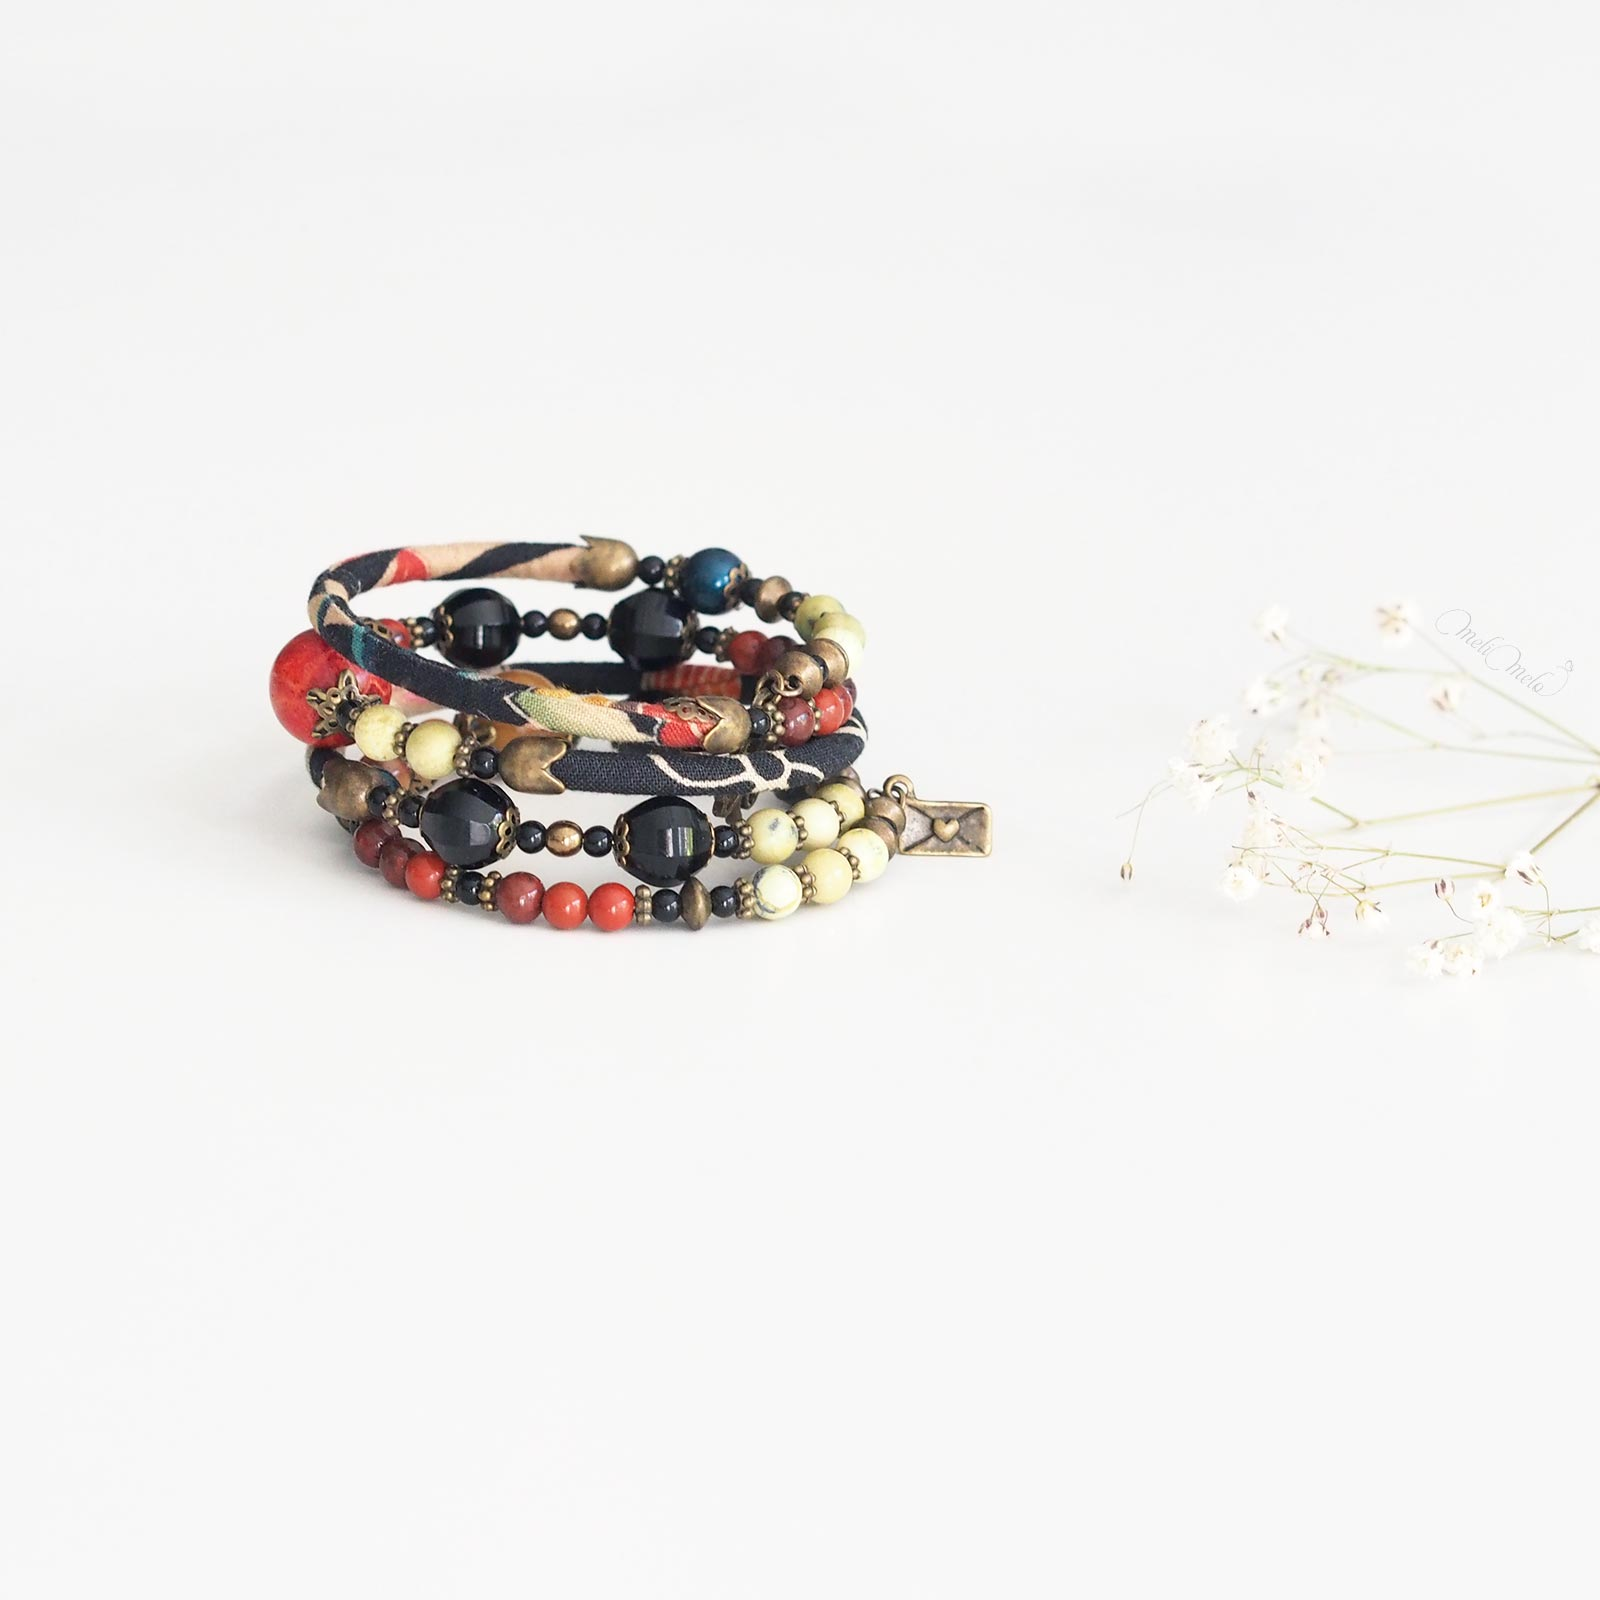 bijoux Temari bracelet corail jaspe crristal swarovski nacré tissu japonais laboutiquedemelimelo